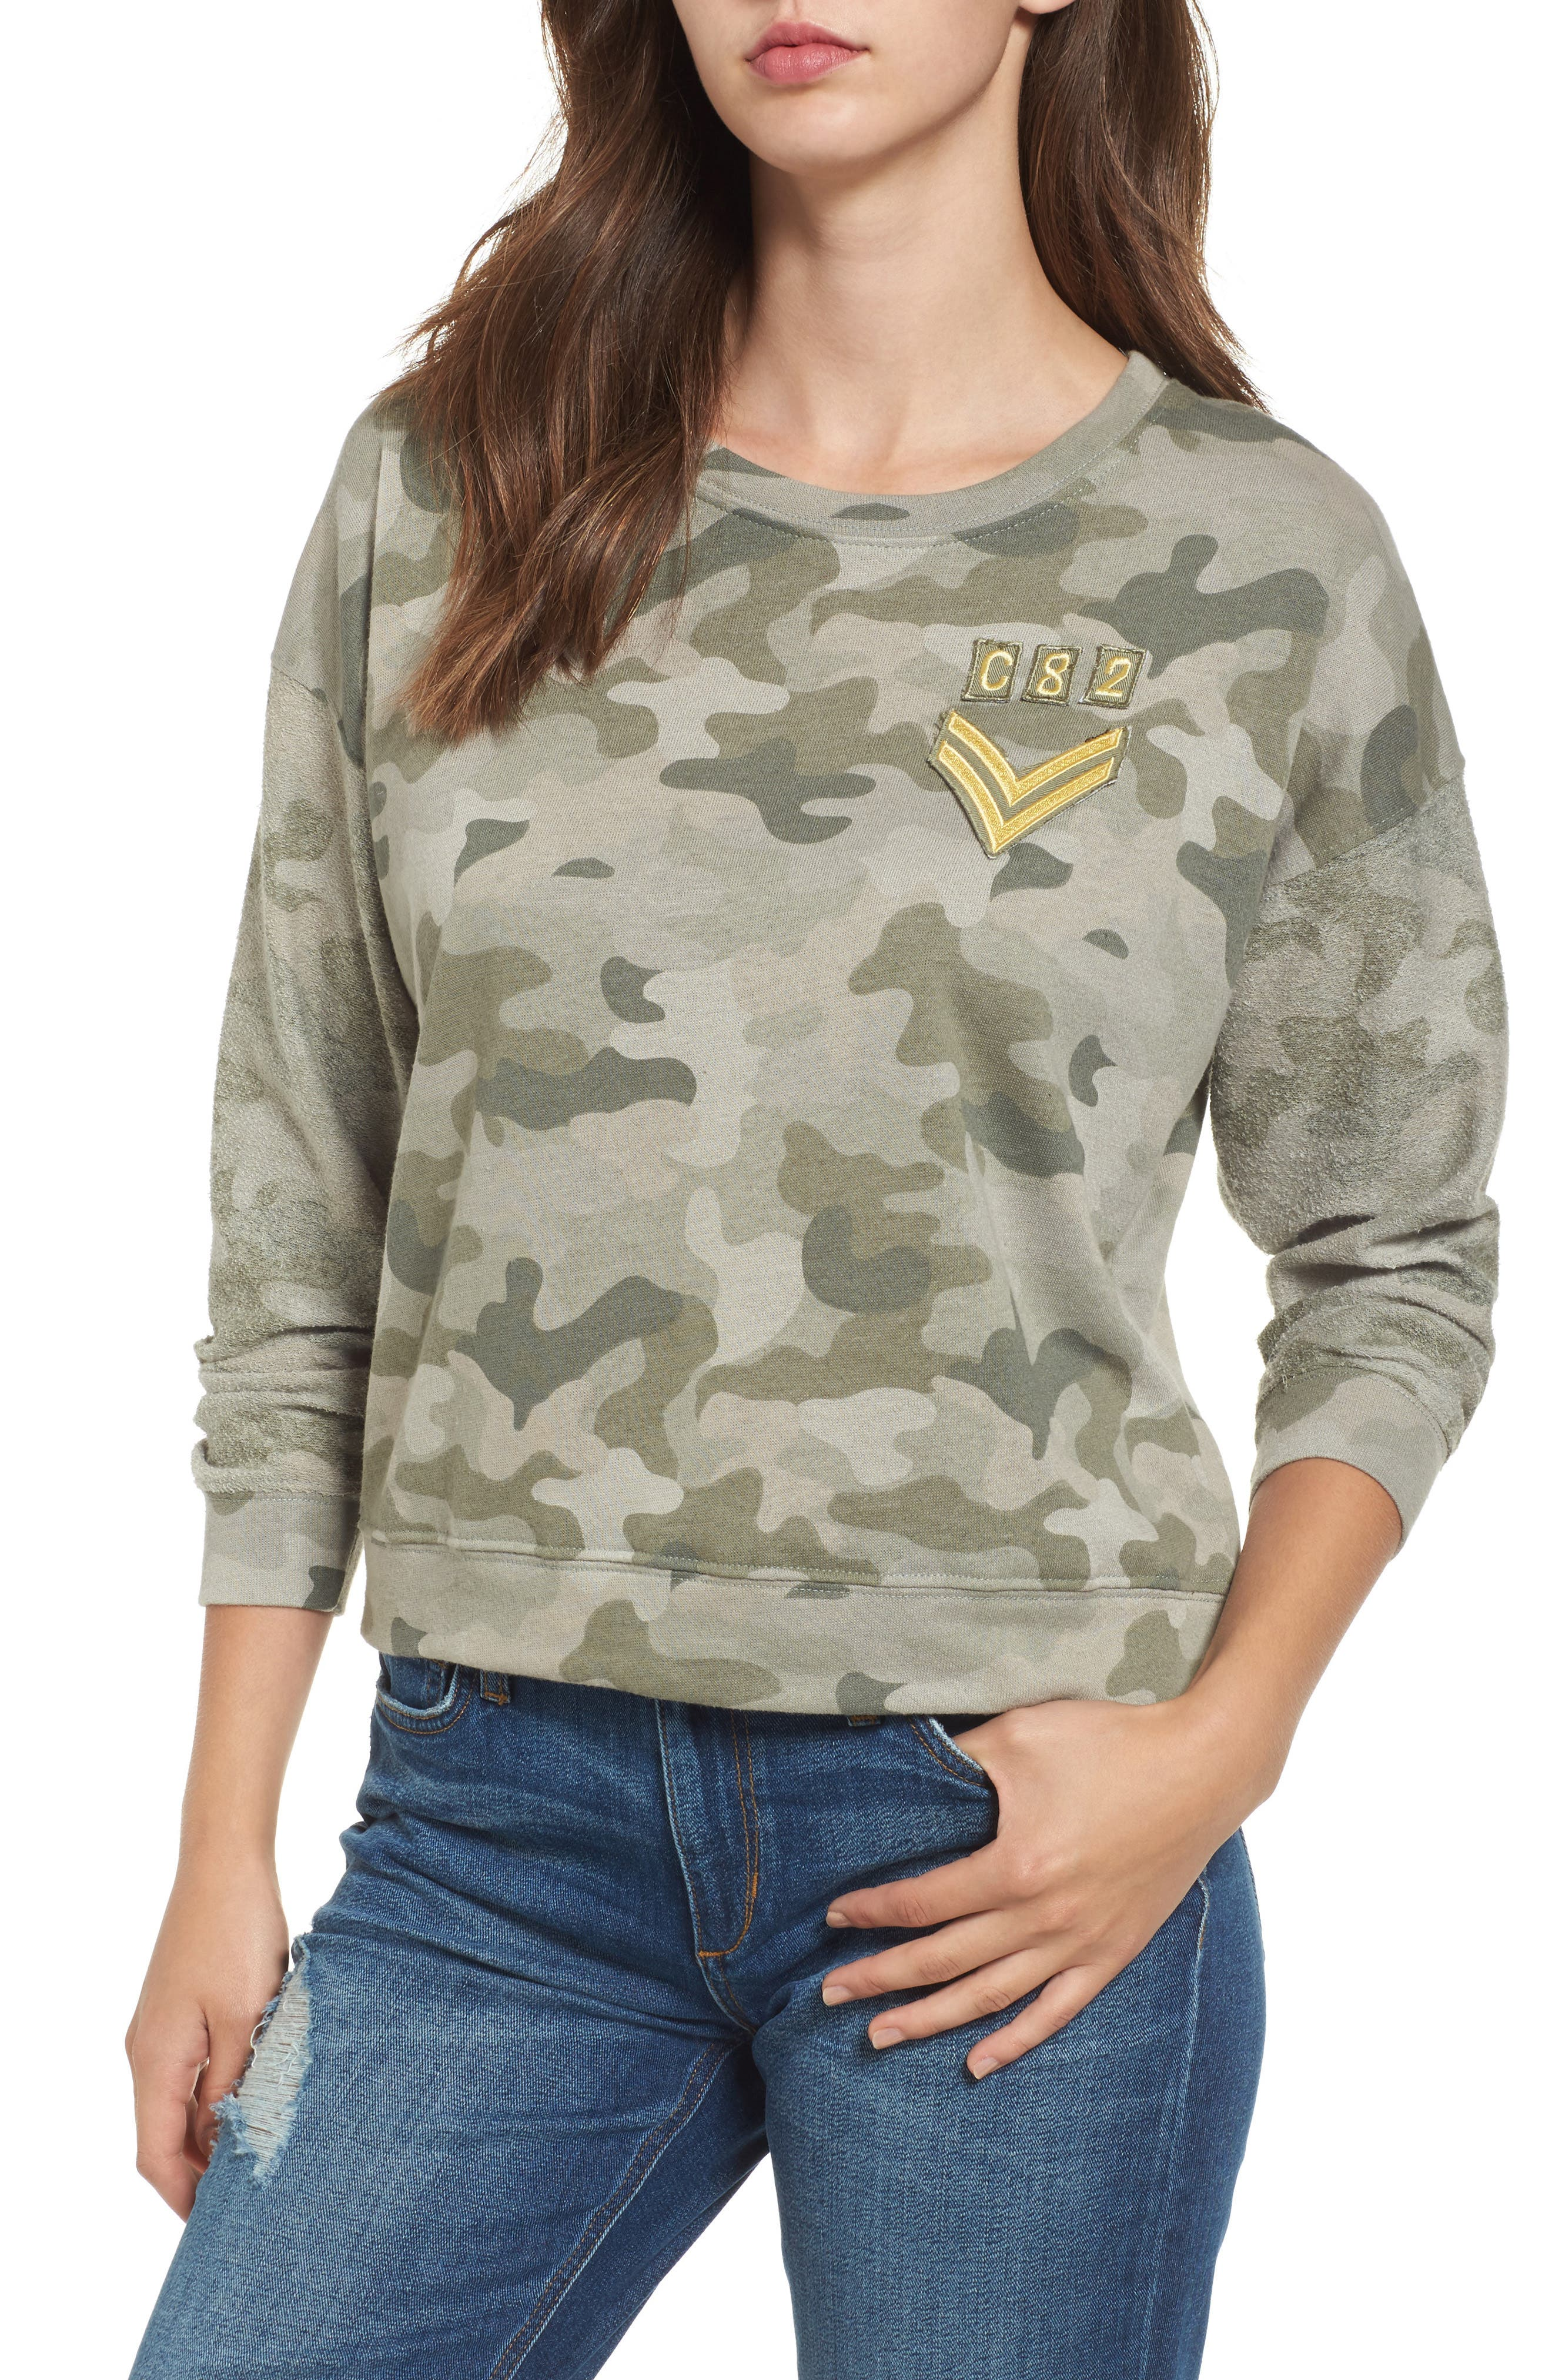 Kelli Camo Print Sweatshirt,                         Main,                         color, Camo